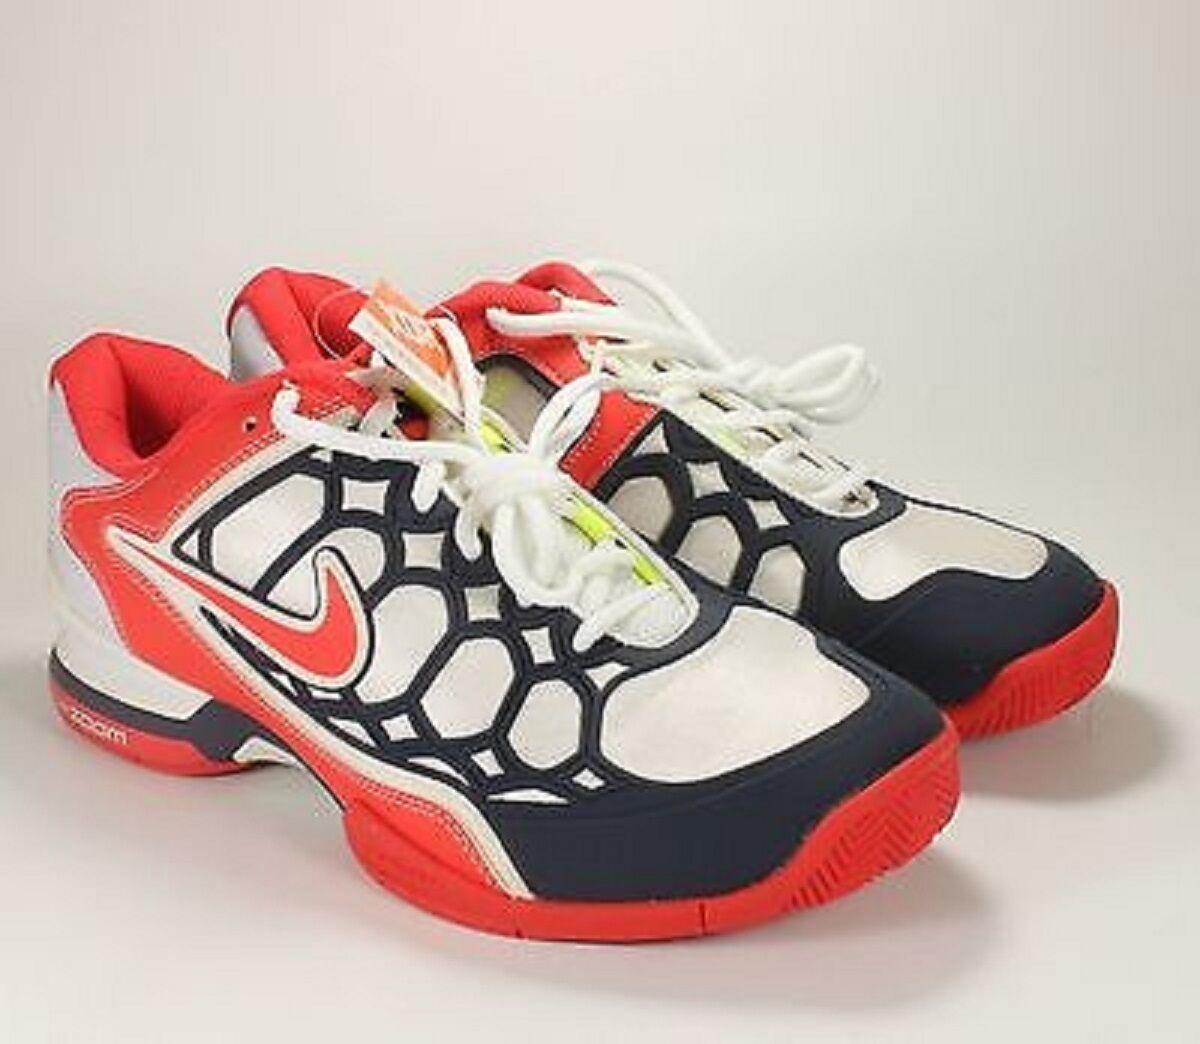 new product 80b5b e6262 NEW donna NIKE NIKE NIKE ZOOM BREATHE 2K (bianca SUNBURST blu) TENNIS scarpe.  518294-164 ee280c